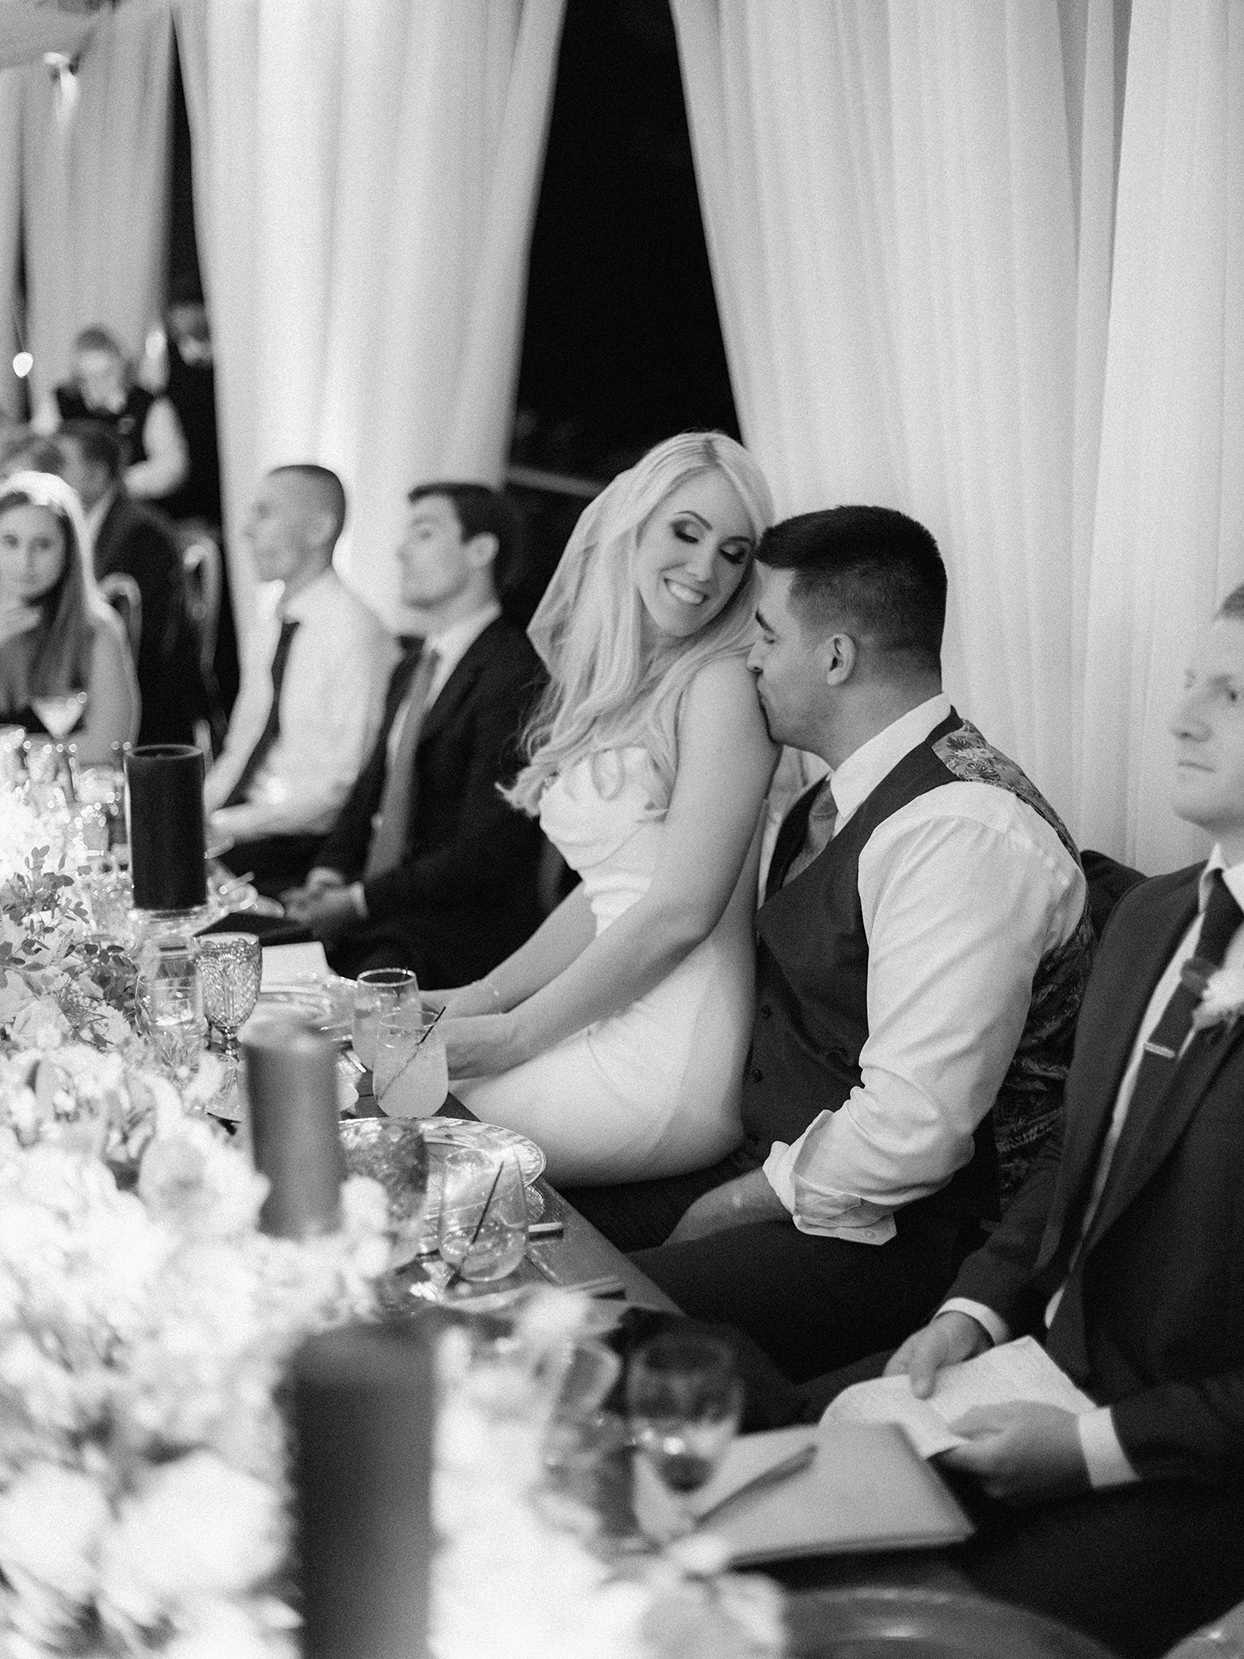 lauren chris wedding bride sitting on groom's lap at reception